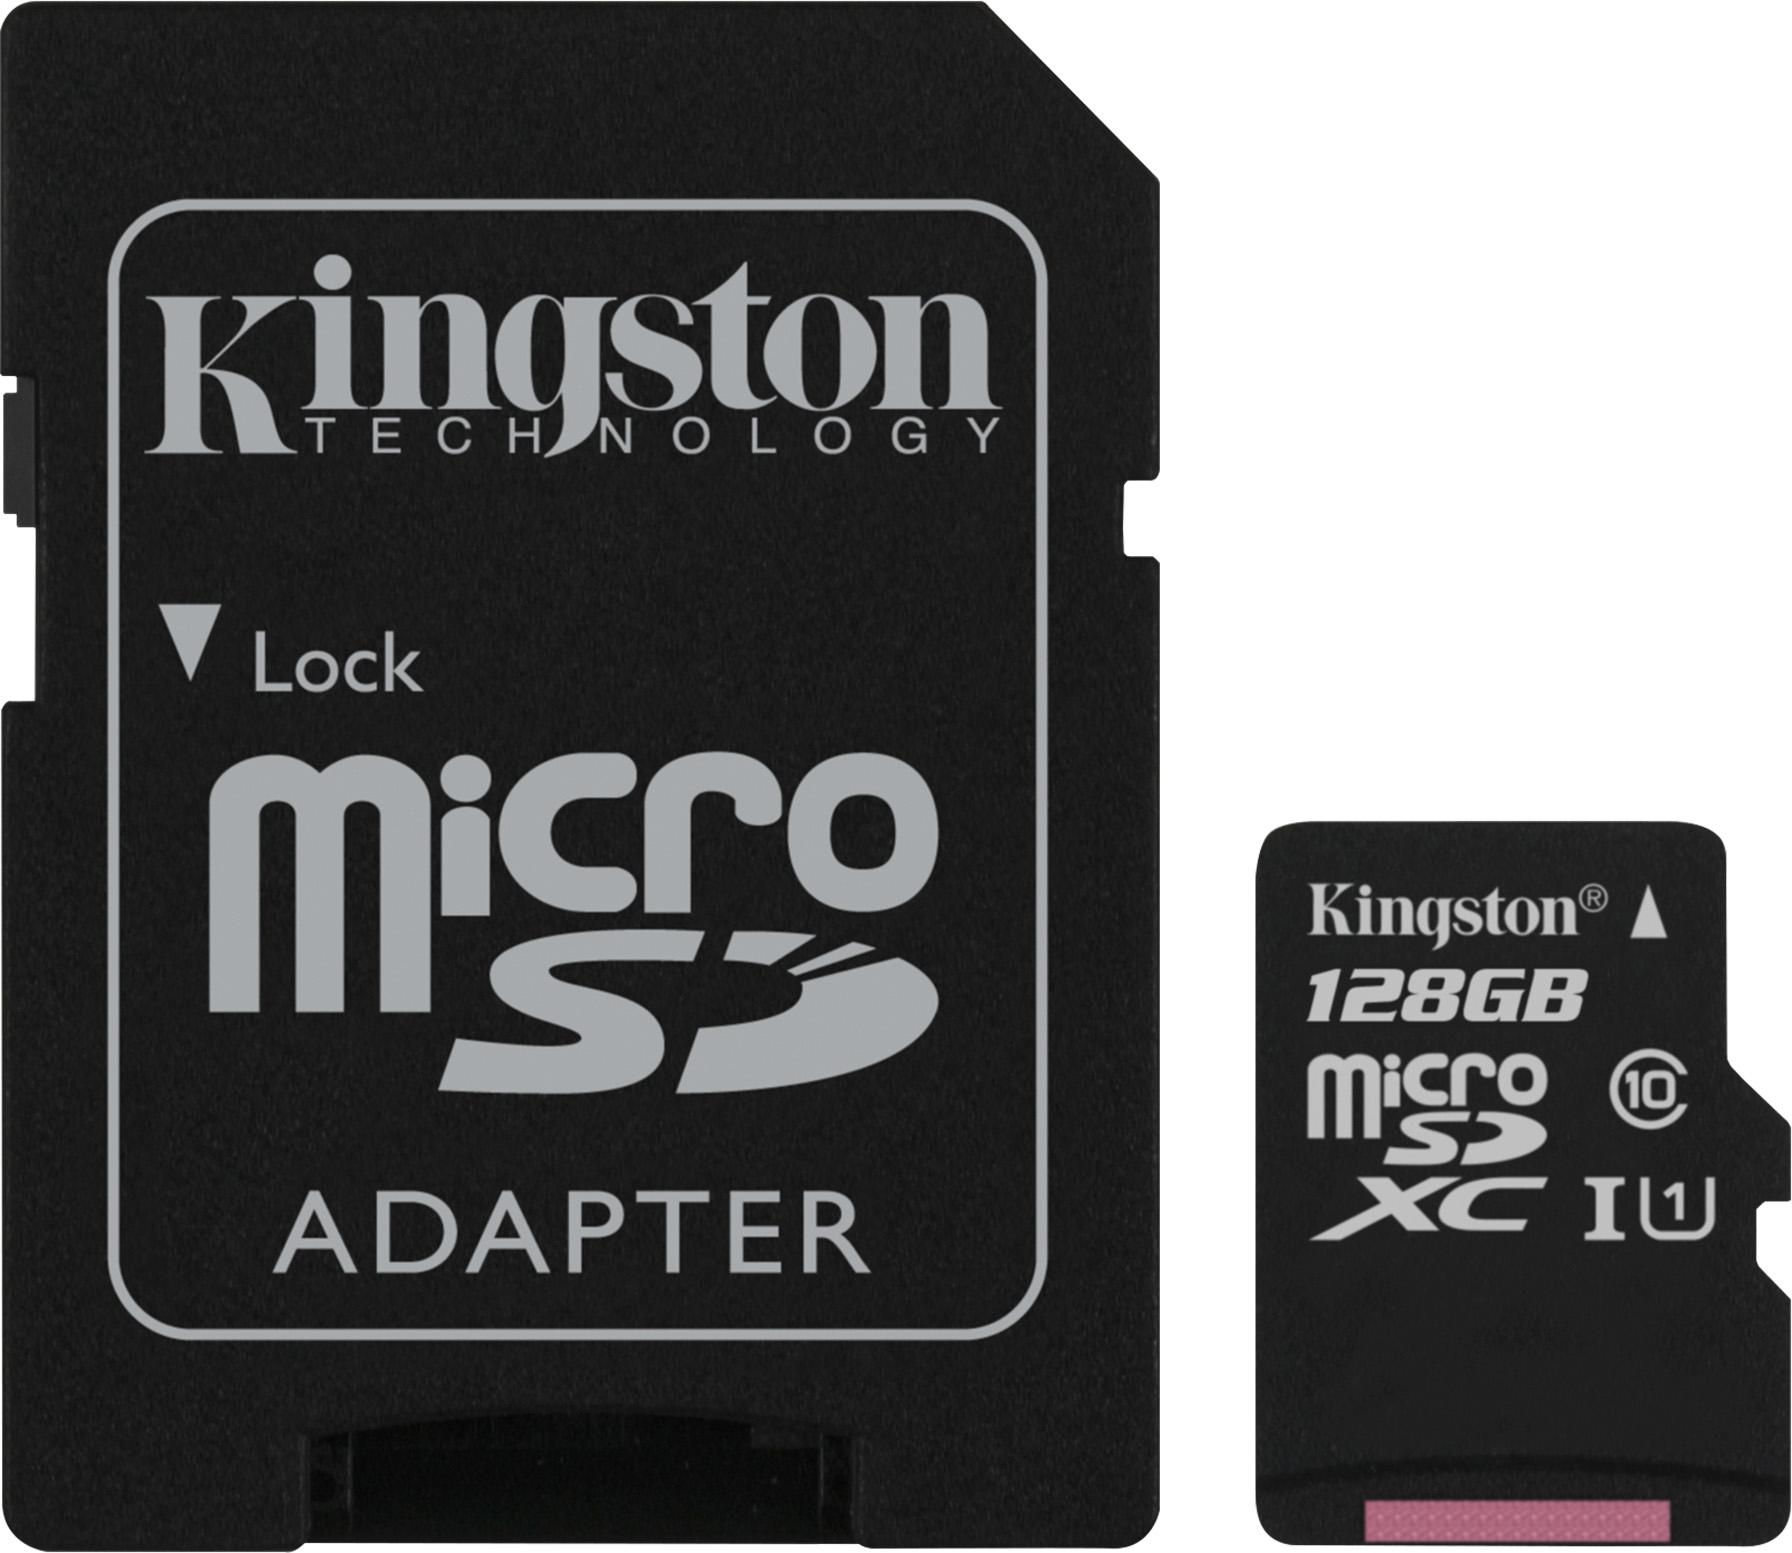 Kingston 128GB microSDXC Class 10 UHS-I 45MB/s Read Card + SD Adapter